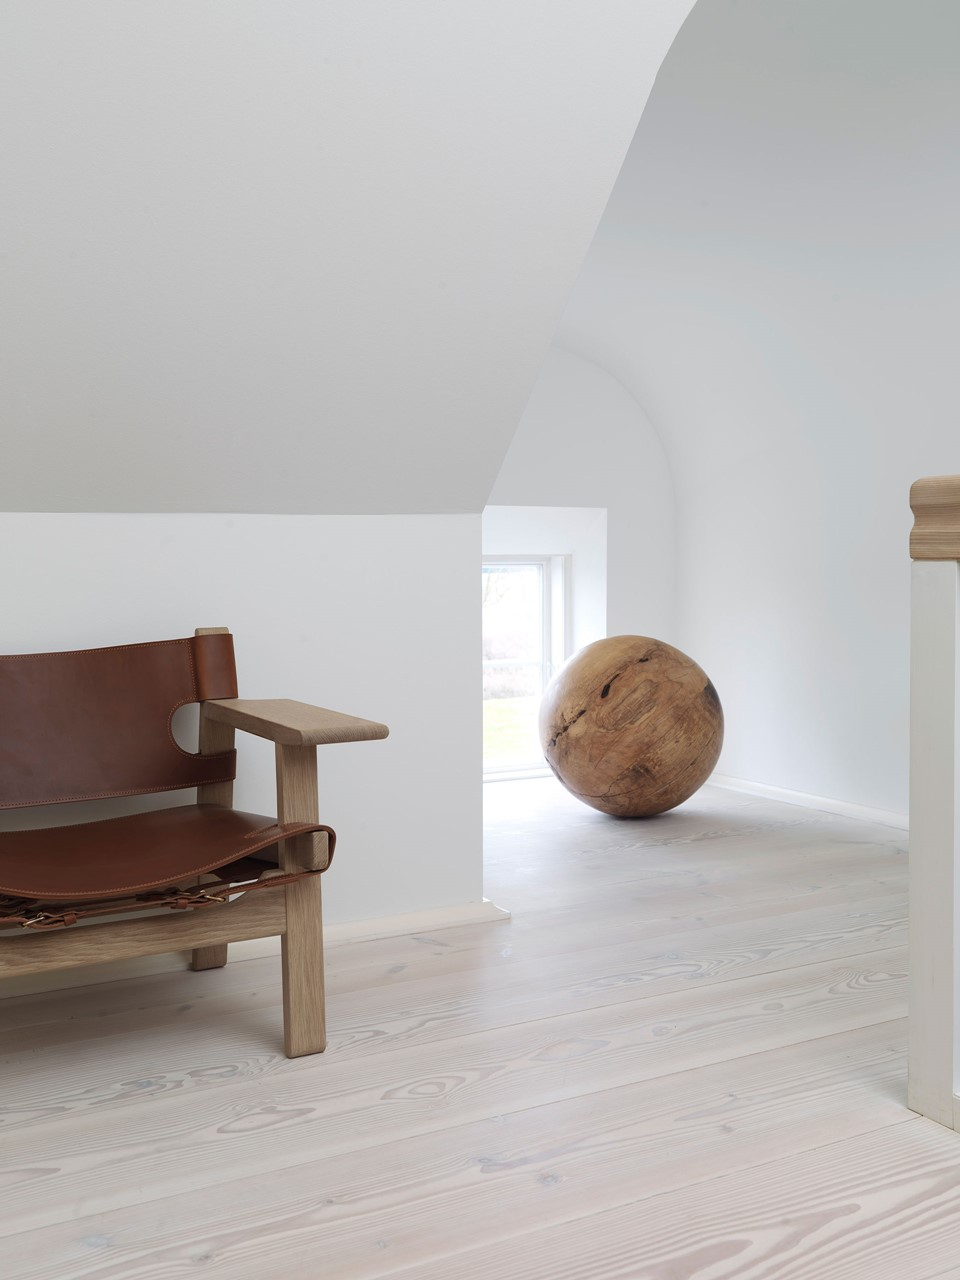 douglas fir floor lye white soap underfloor heating bedroom dinesen country home.jpg